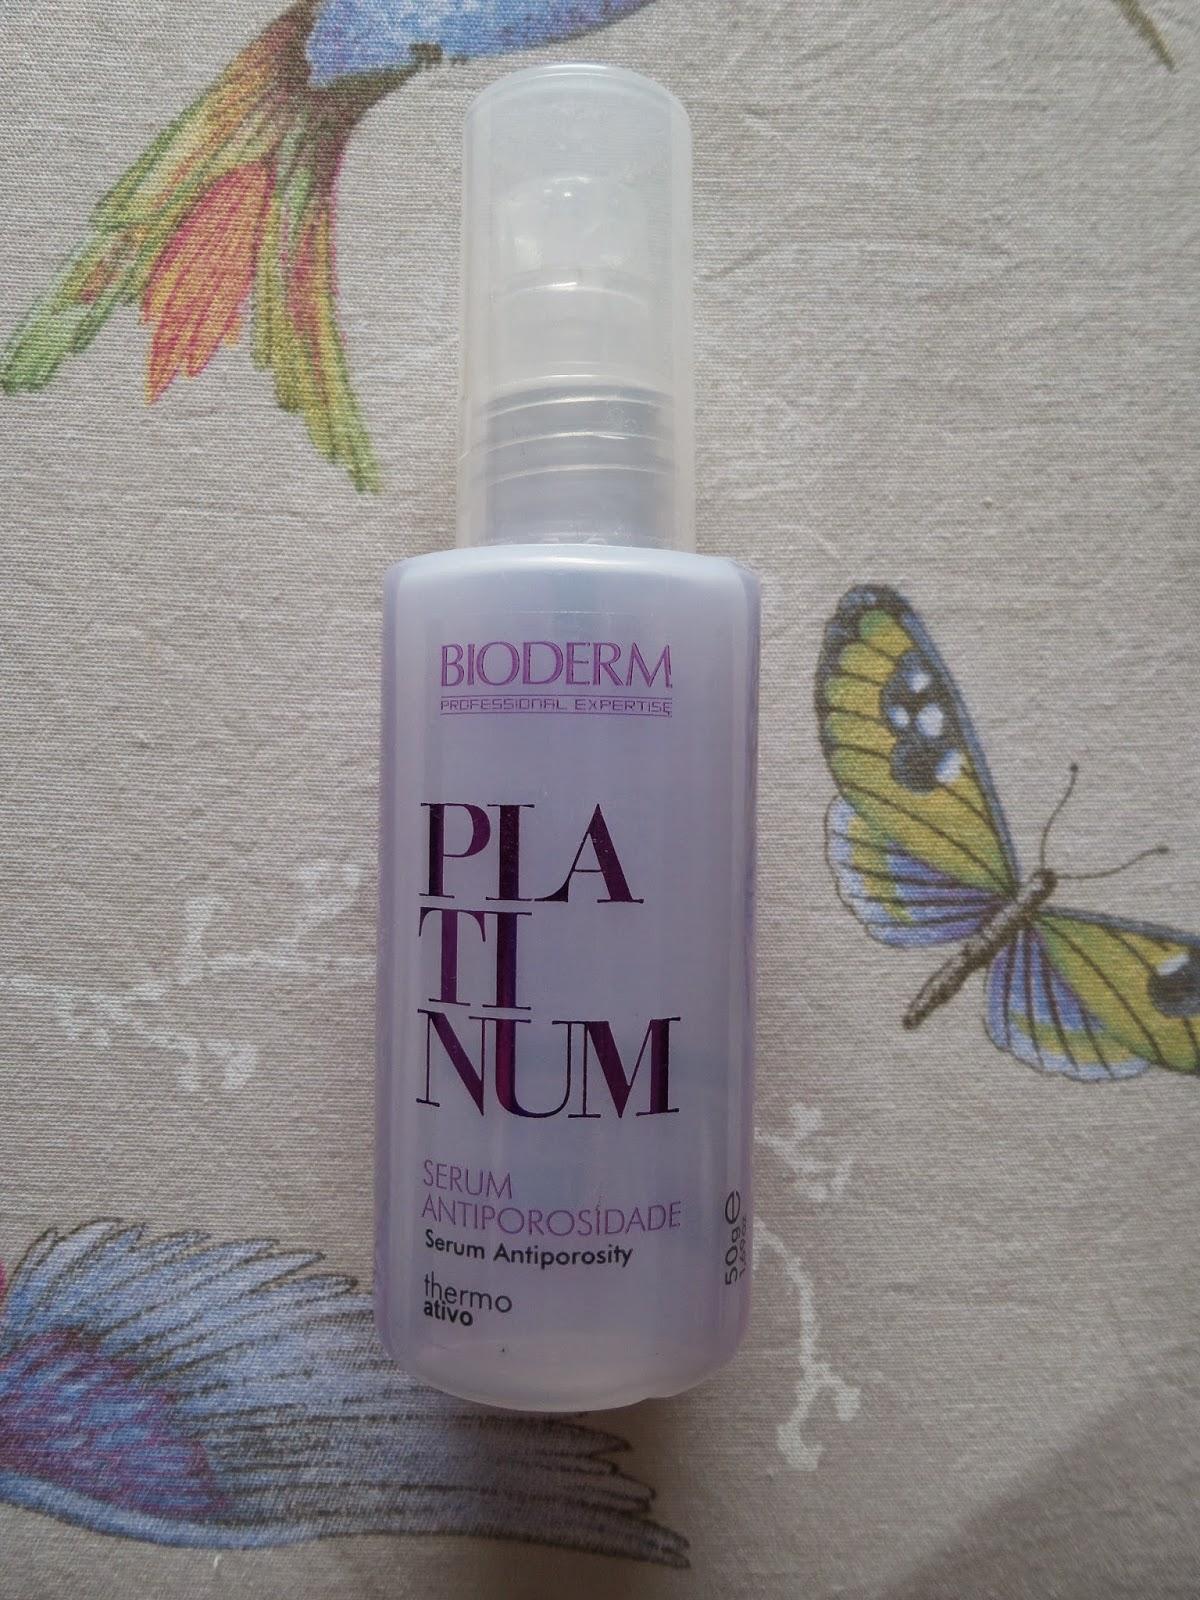 Serum Bioderm Platinum Antiporosidade Thermo Ativo. Para cableos loiros,